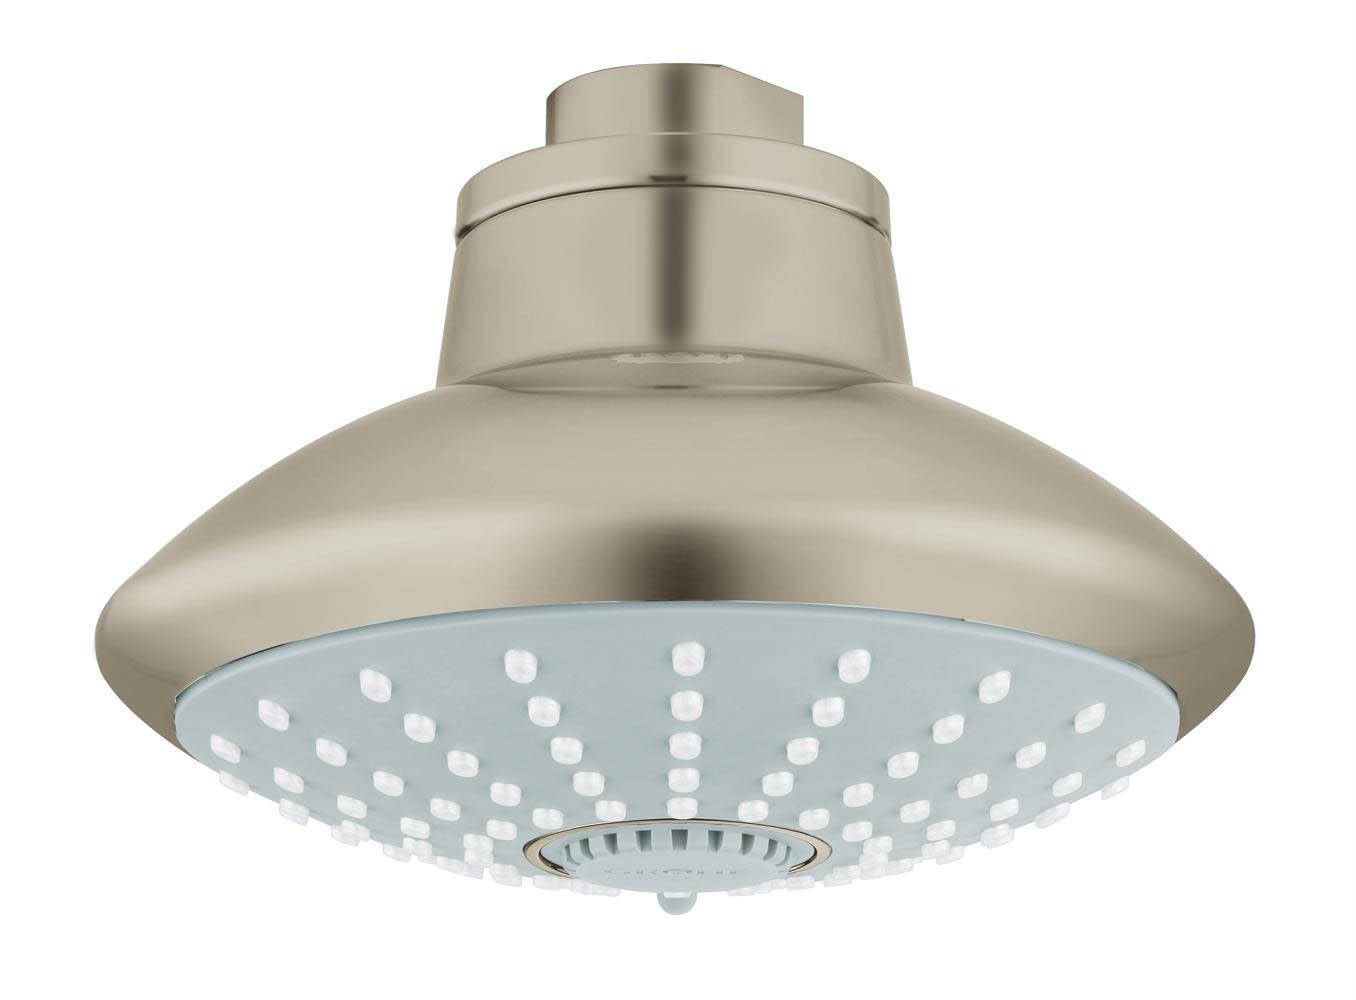 Best Shower Heads: High Pressure, Rain Shower, and Eco Friendly ...